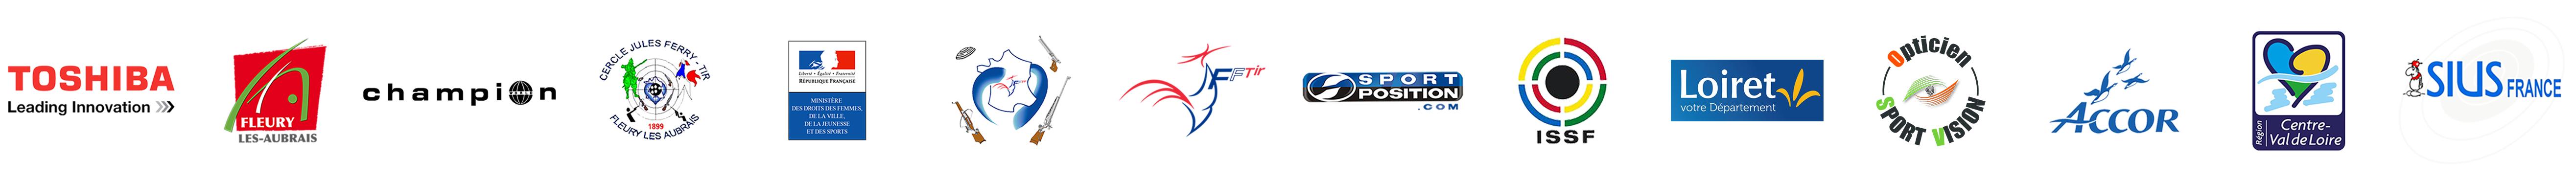 logo GP Fleury 2017.jpg